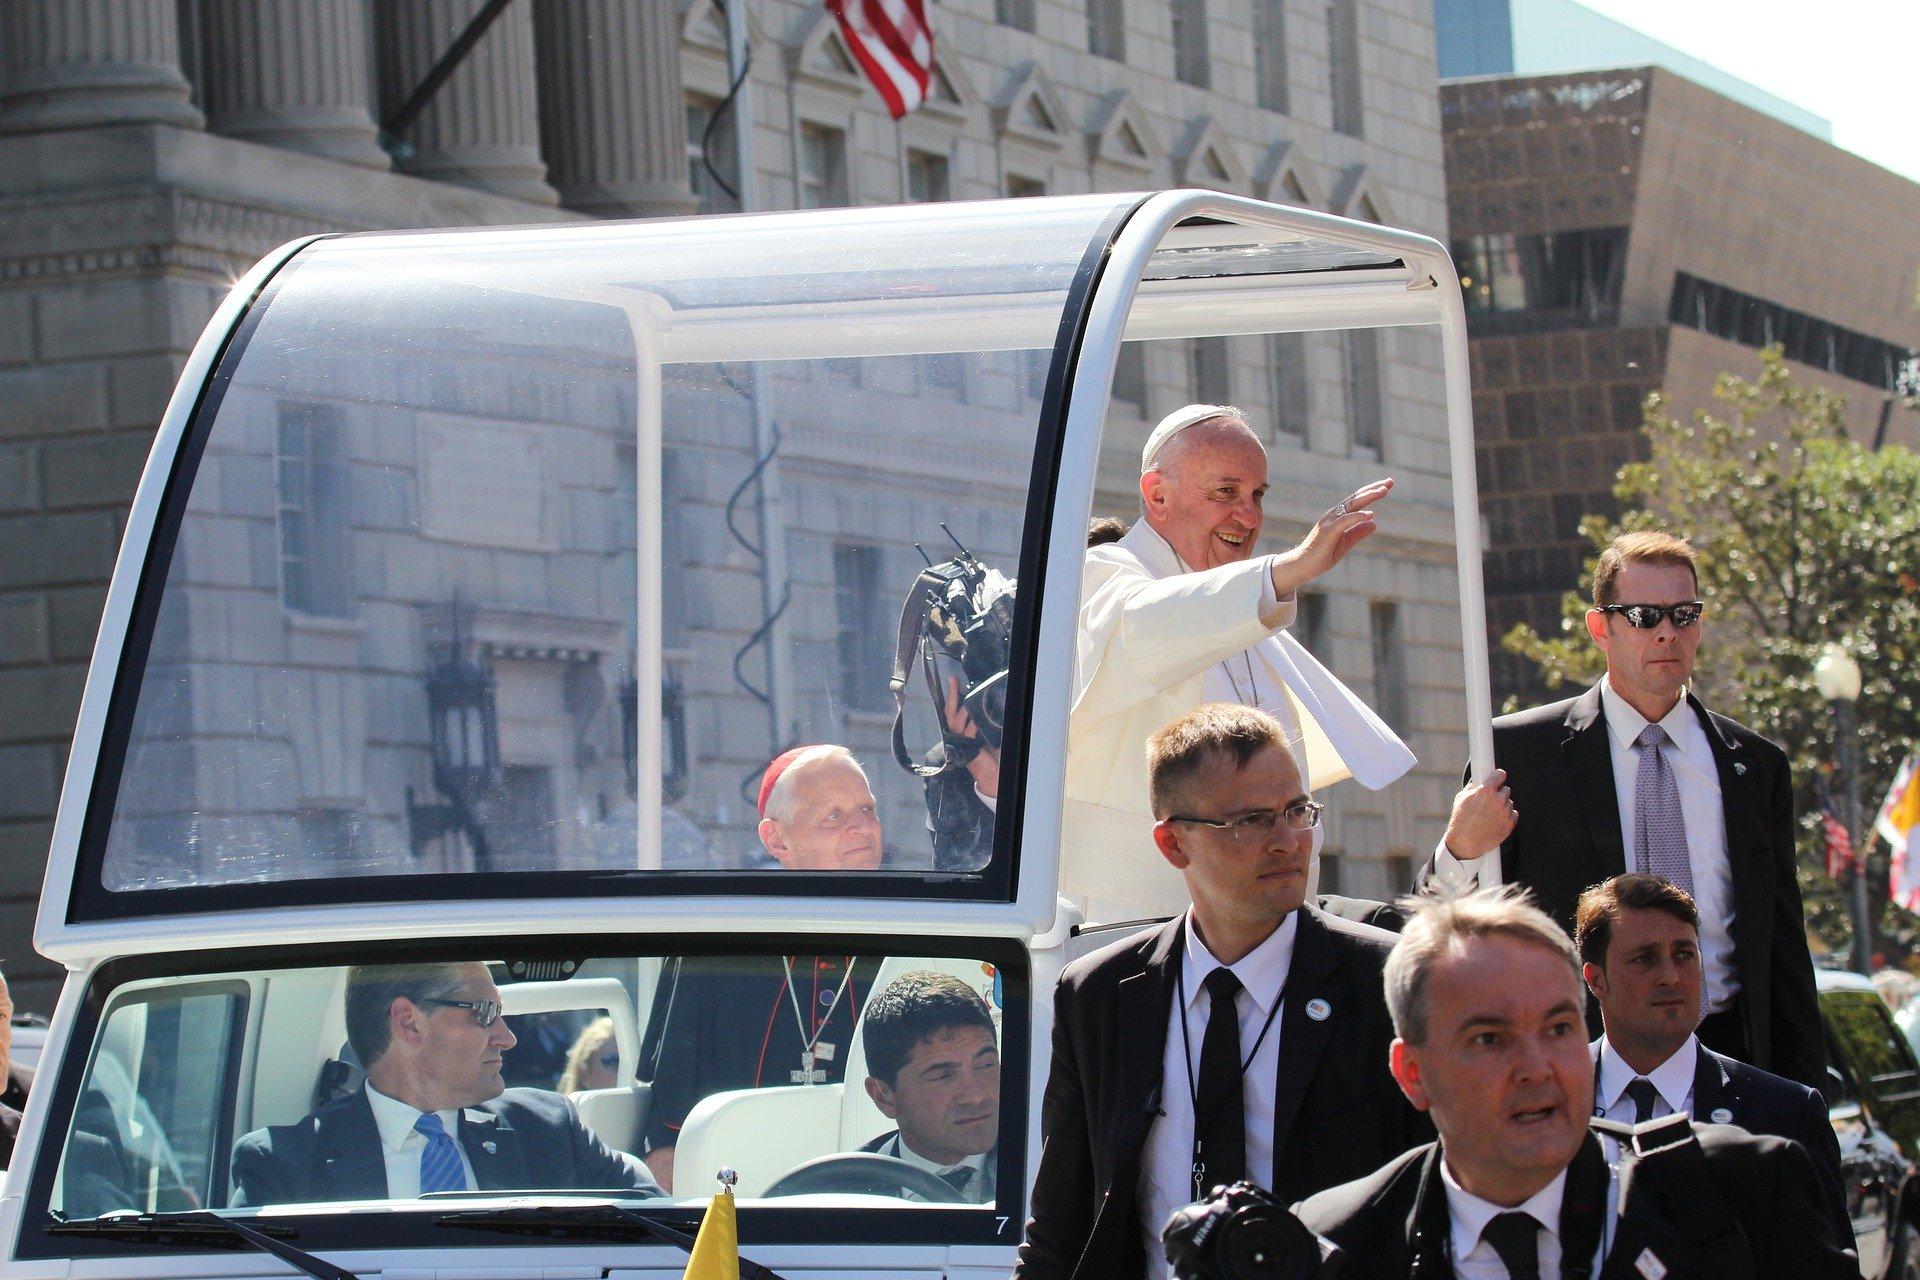 Papež podpira homoseksualne partnerske zveze